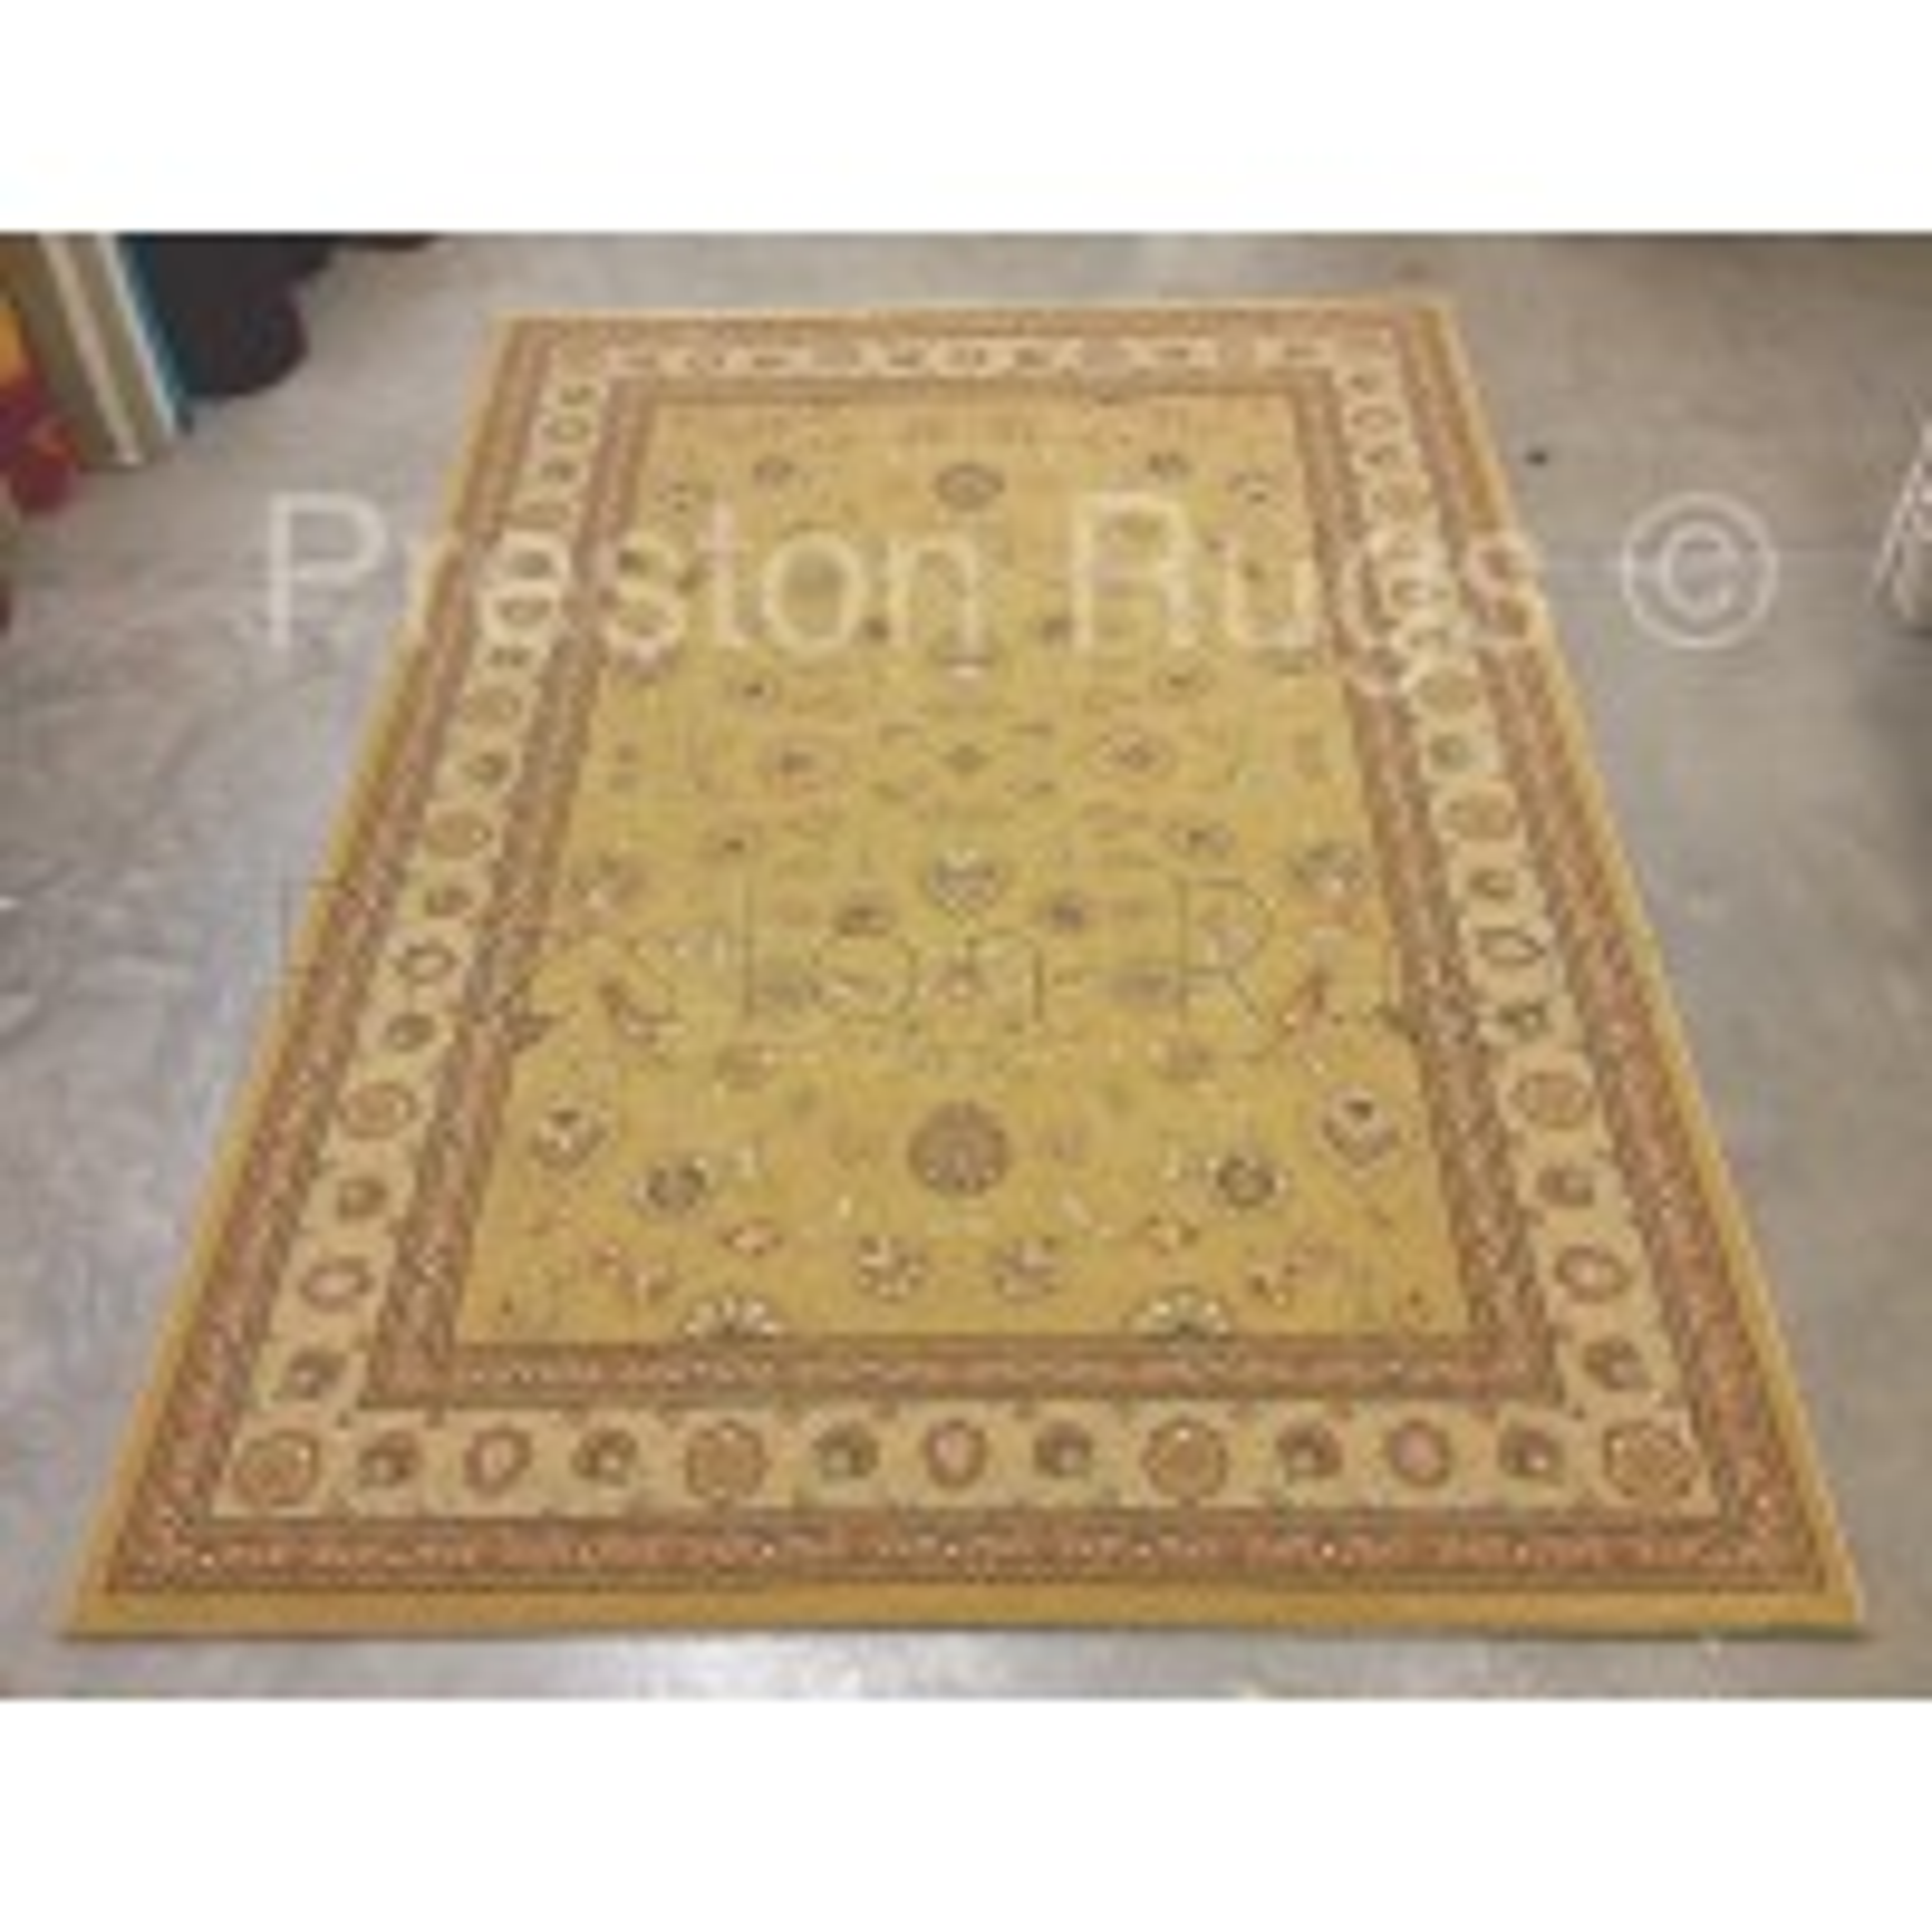 Noble Art Traditional Persian Agra Design Rug - Gold Beige Cream 6529/790